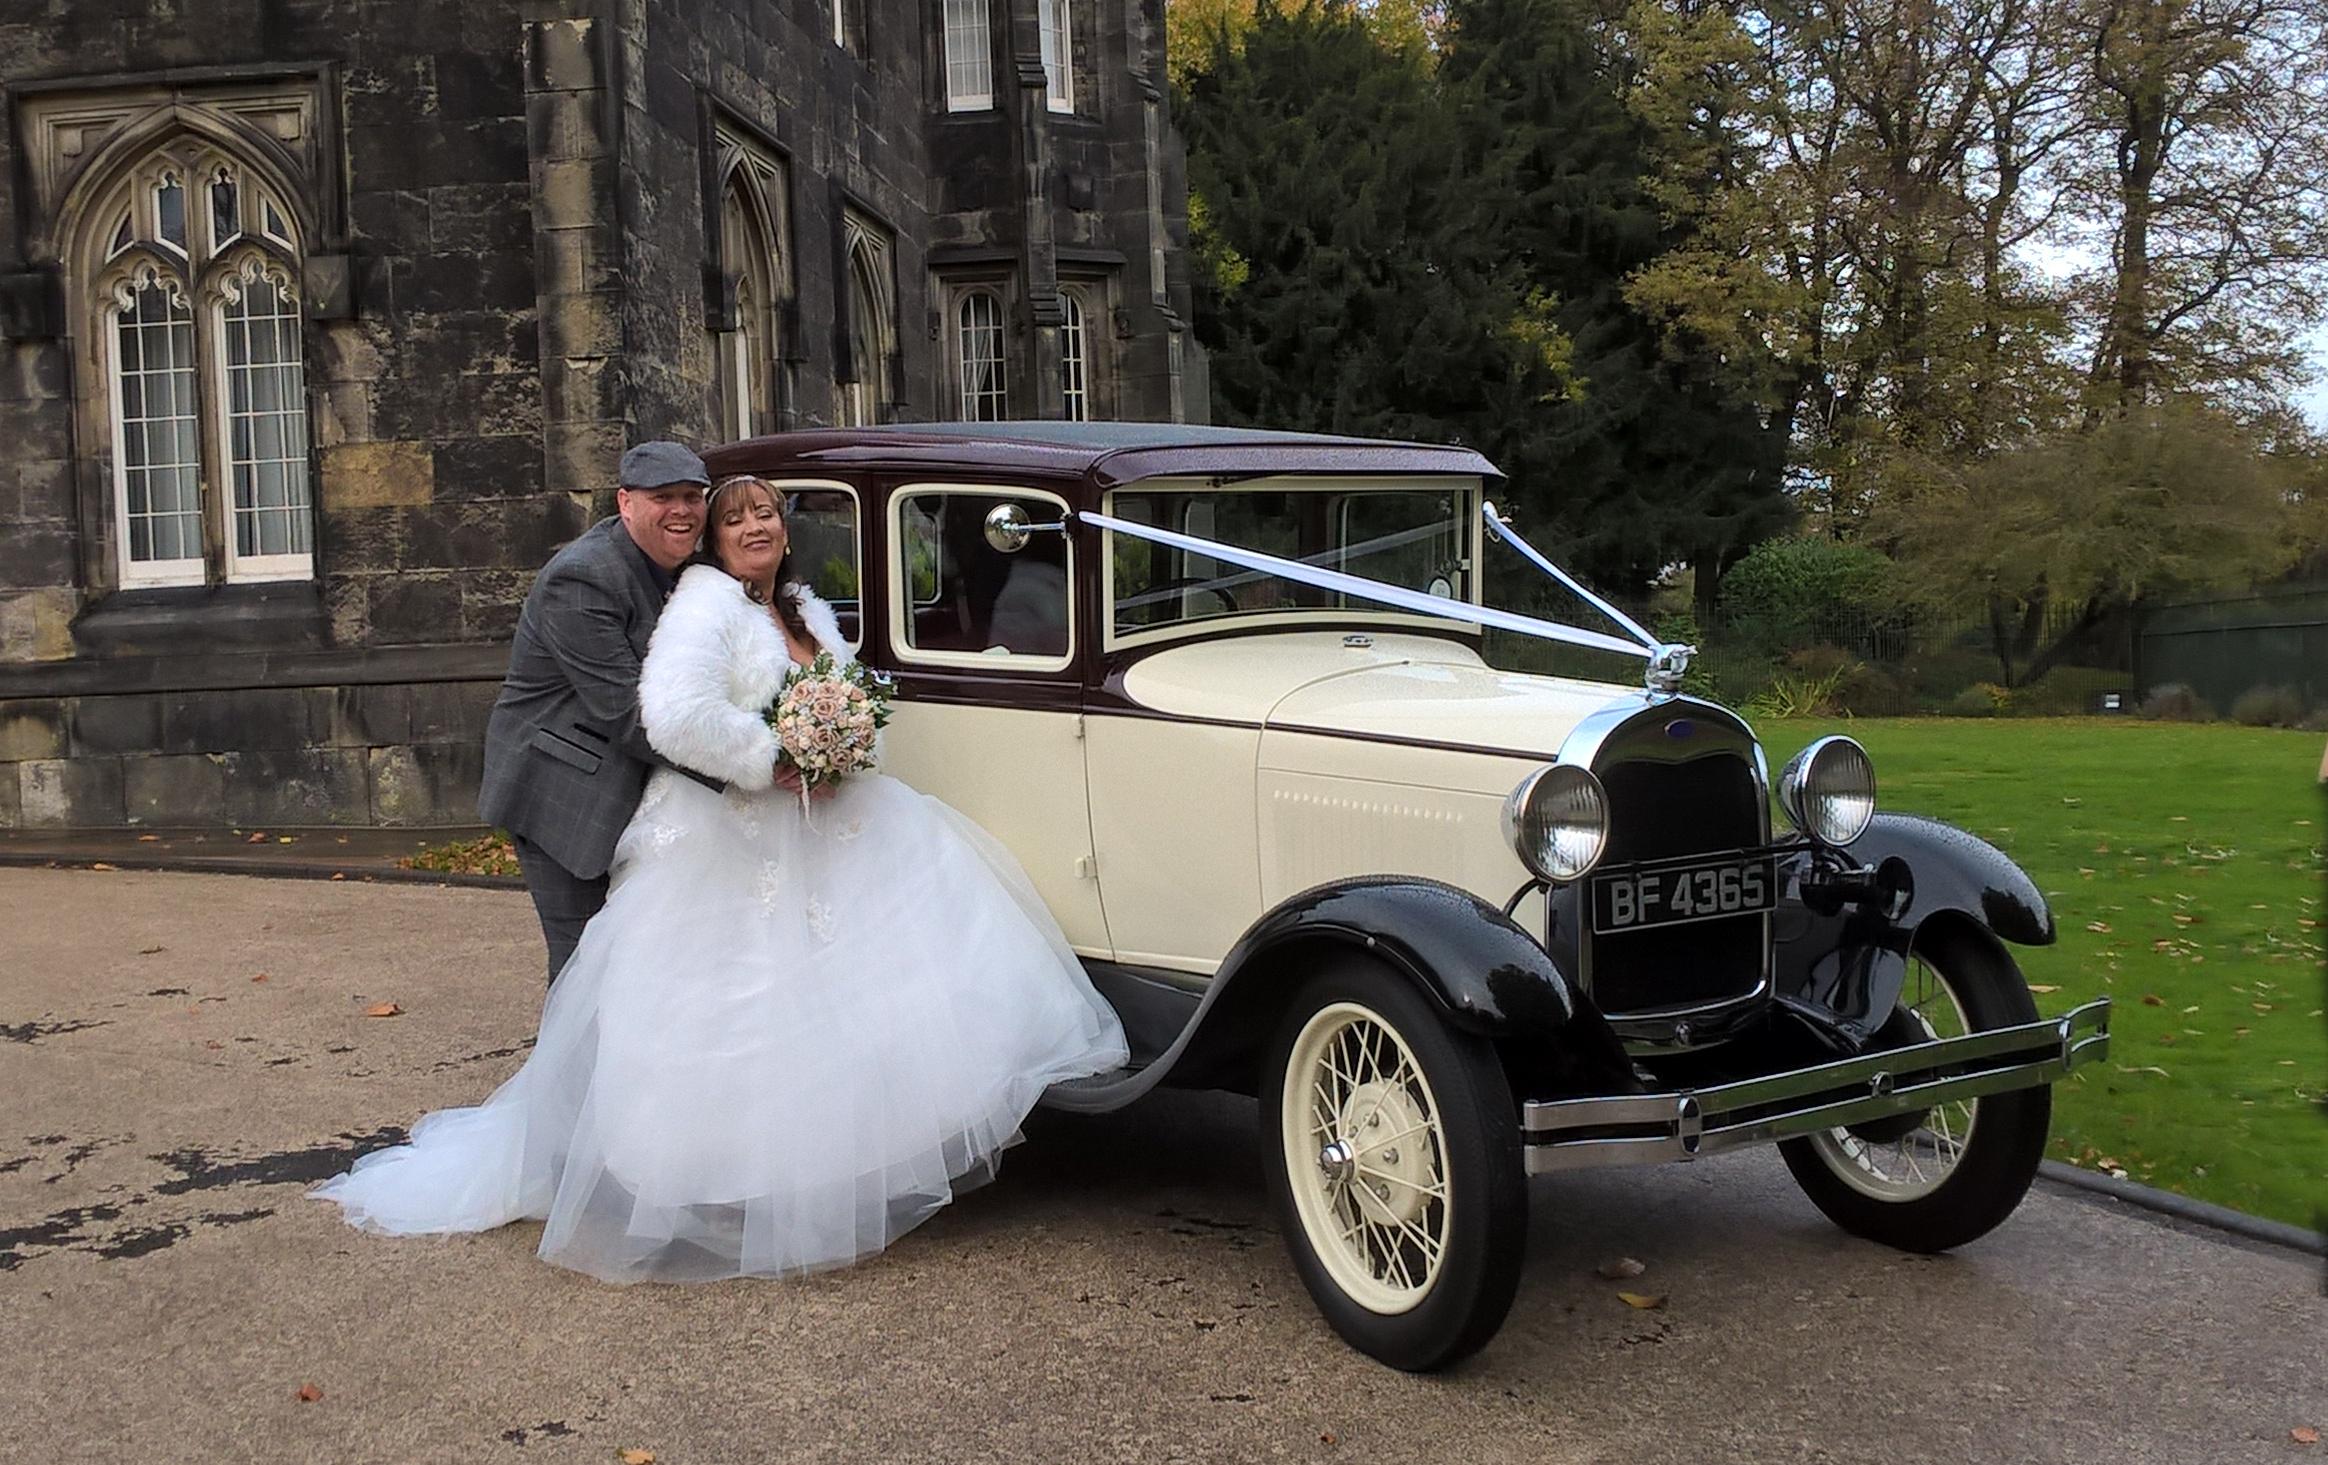 wedding car hire prices - Classic Weddings